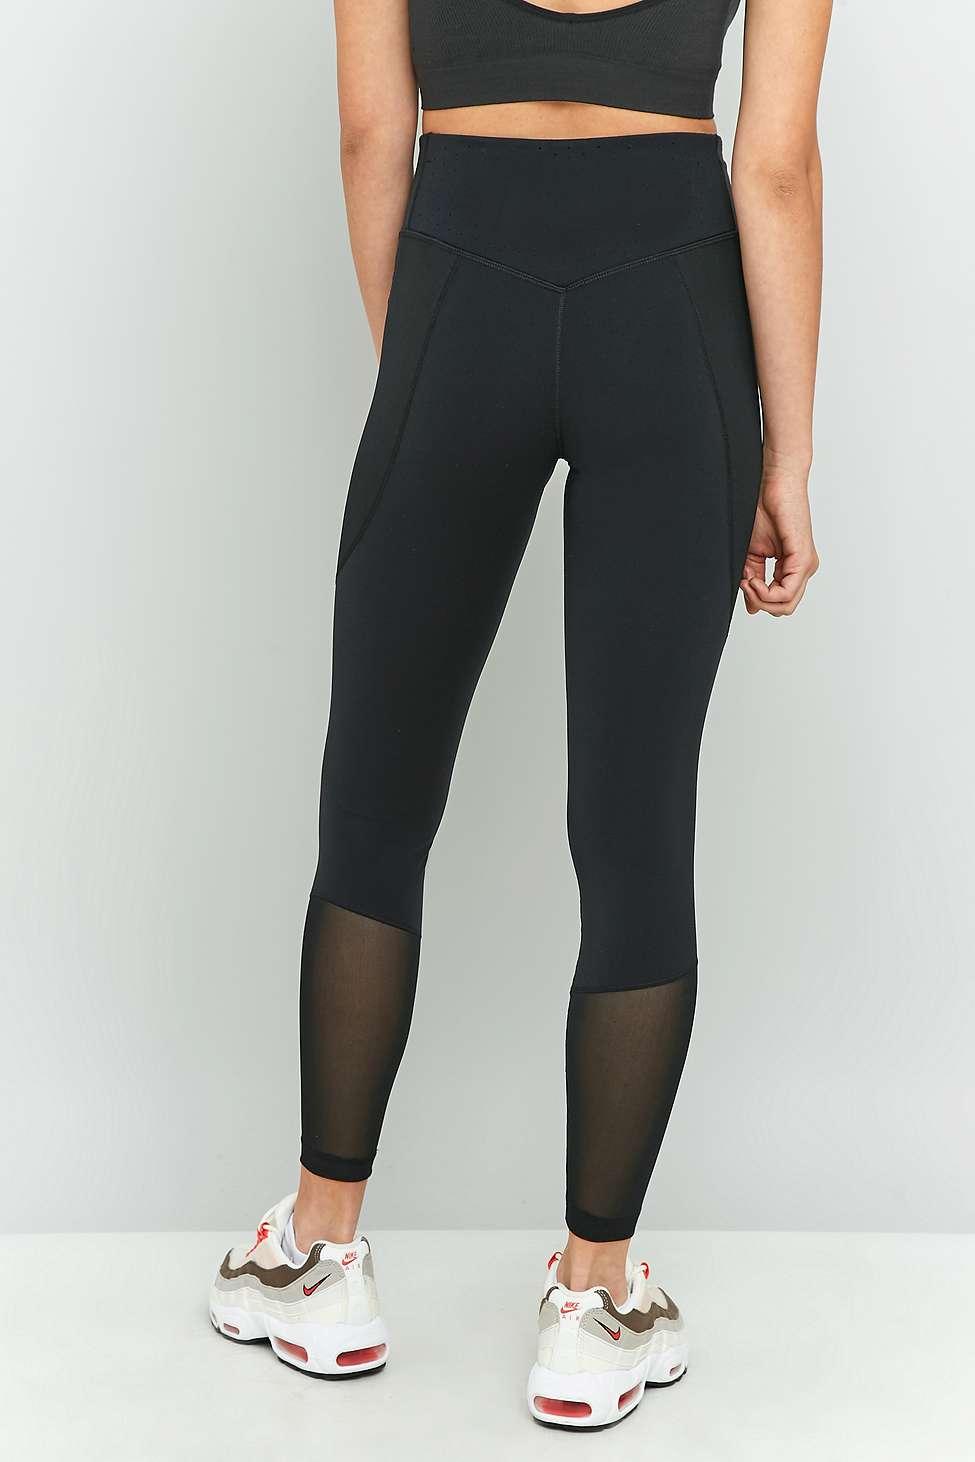 Nike Tech Mesh Panel Leggings | Urban Outfitters